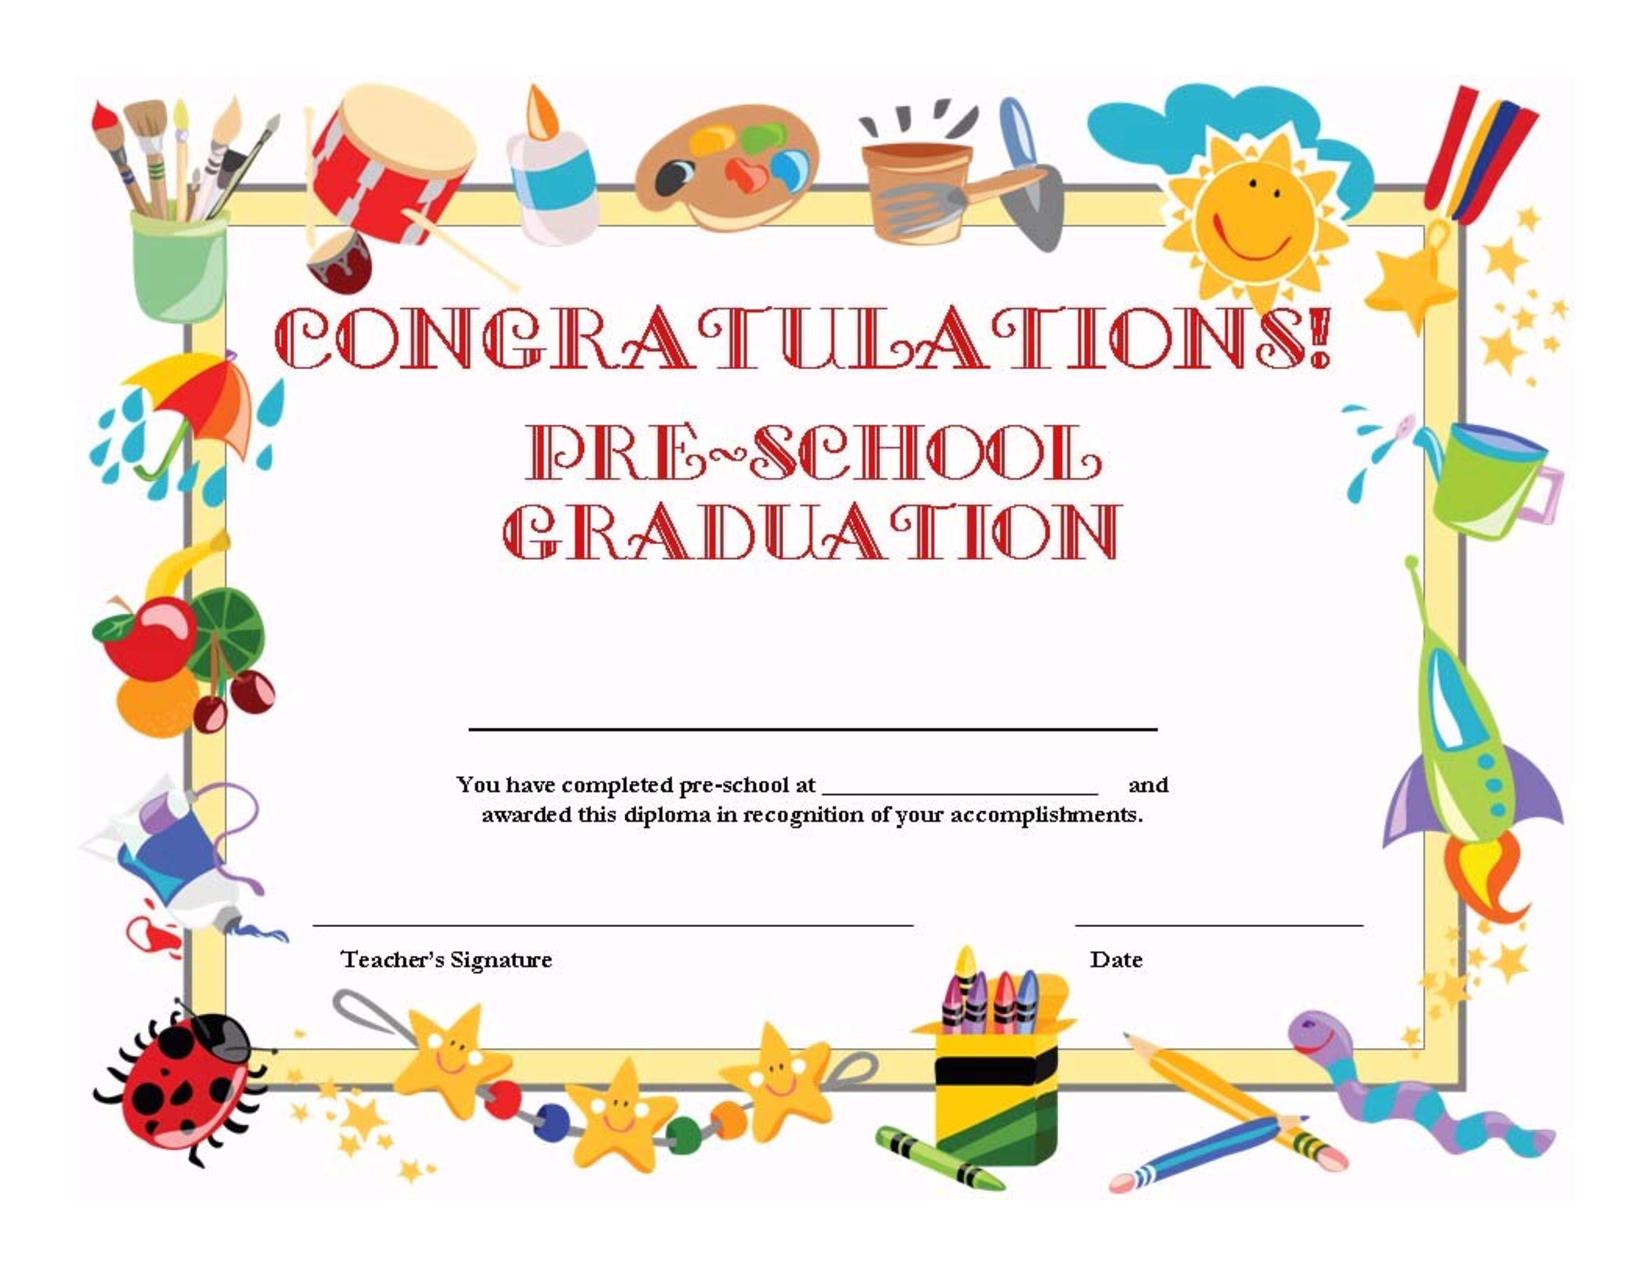 Preschool Graduation Certificate Template Free | ⇢Kindergarten - Preschool Graduation Diploma Free Printable